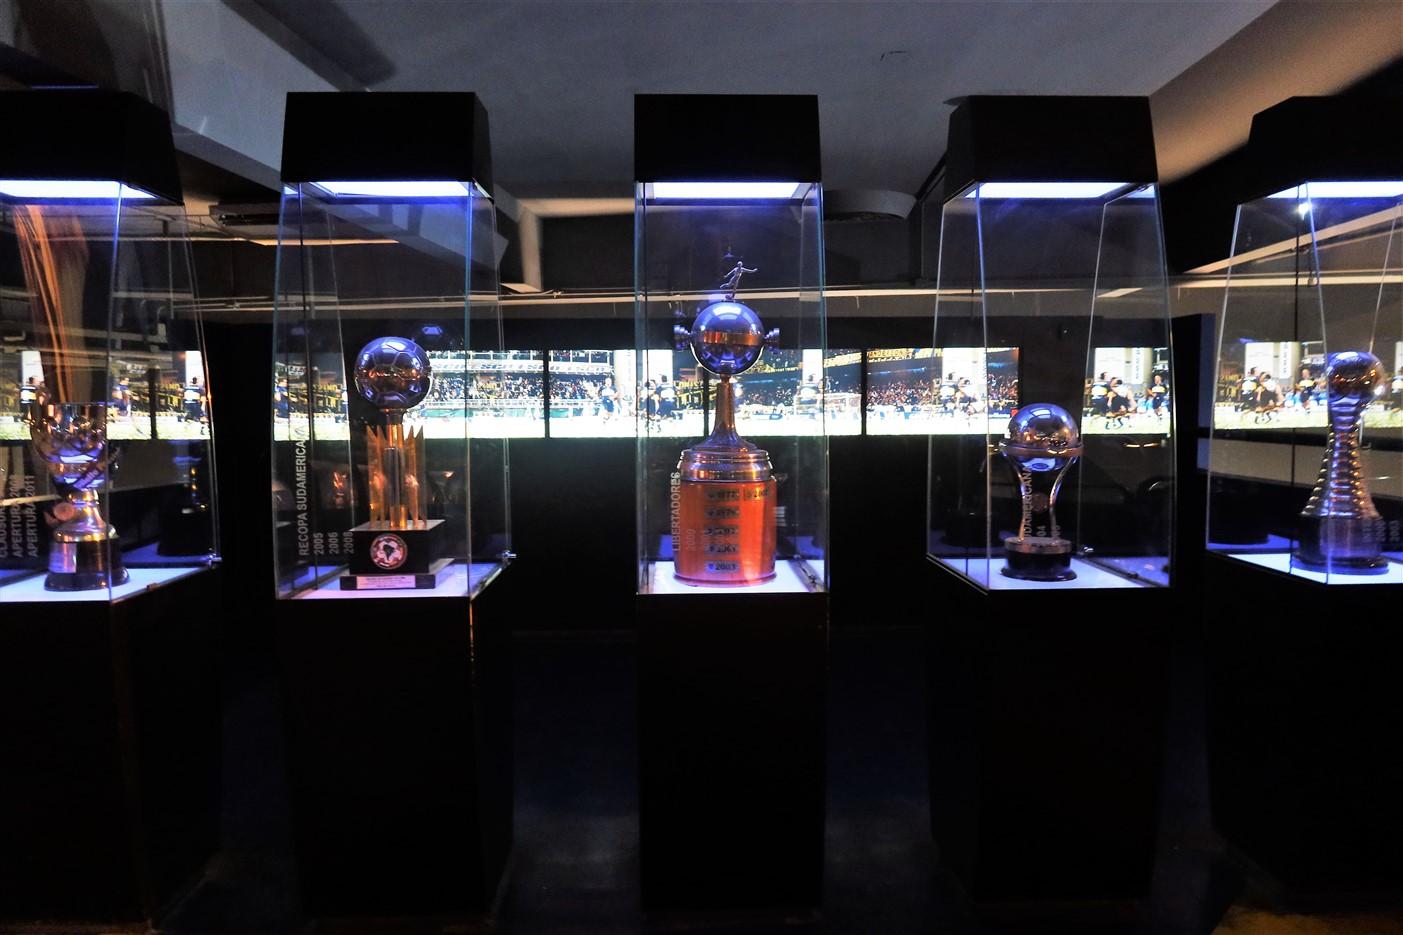 2020 03 08 94 Buenos Aires Boca Juniors Soccer Team.jpg